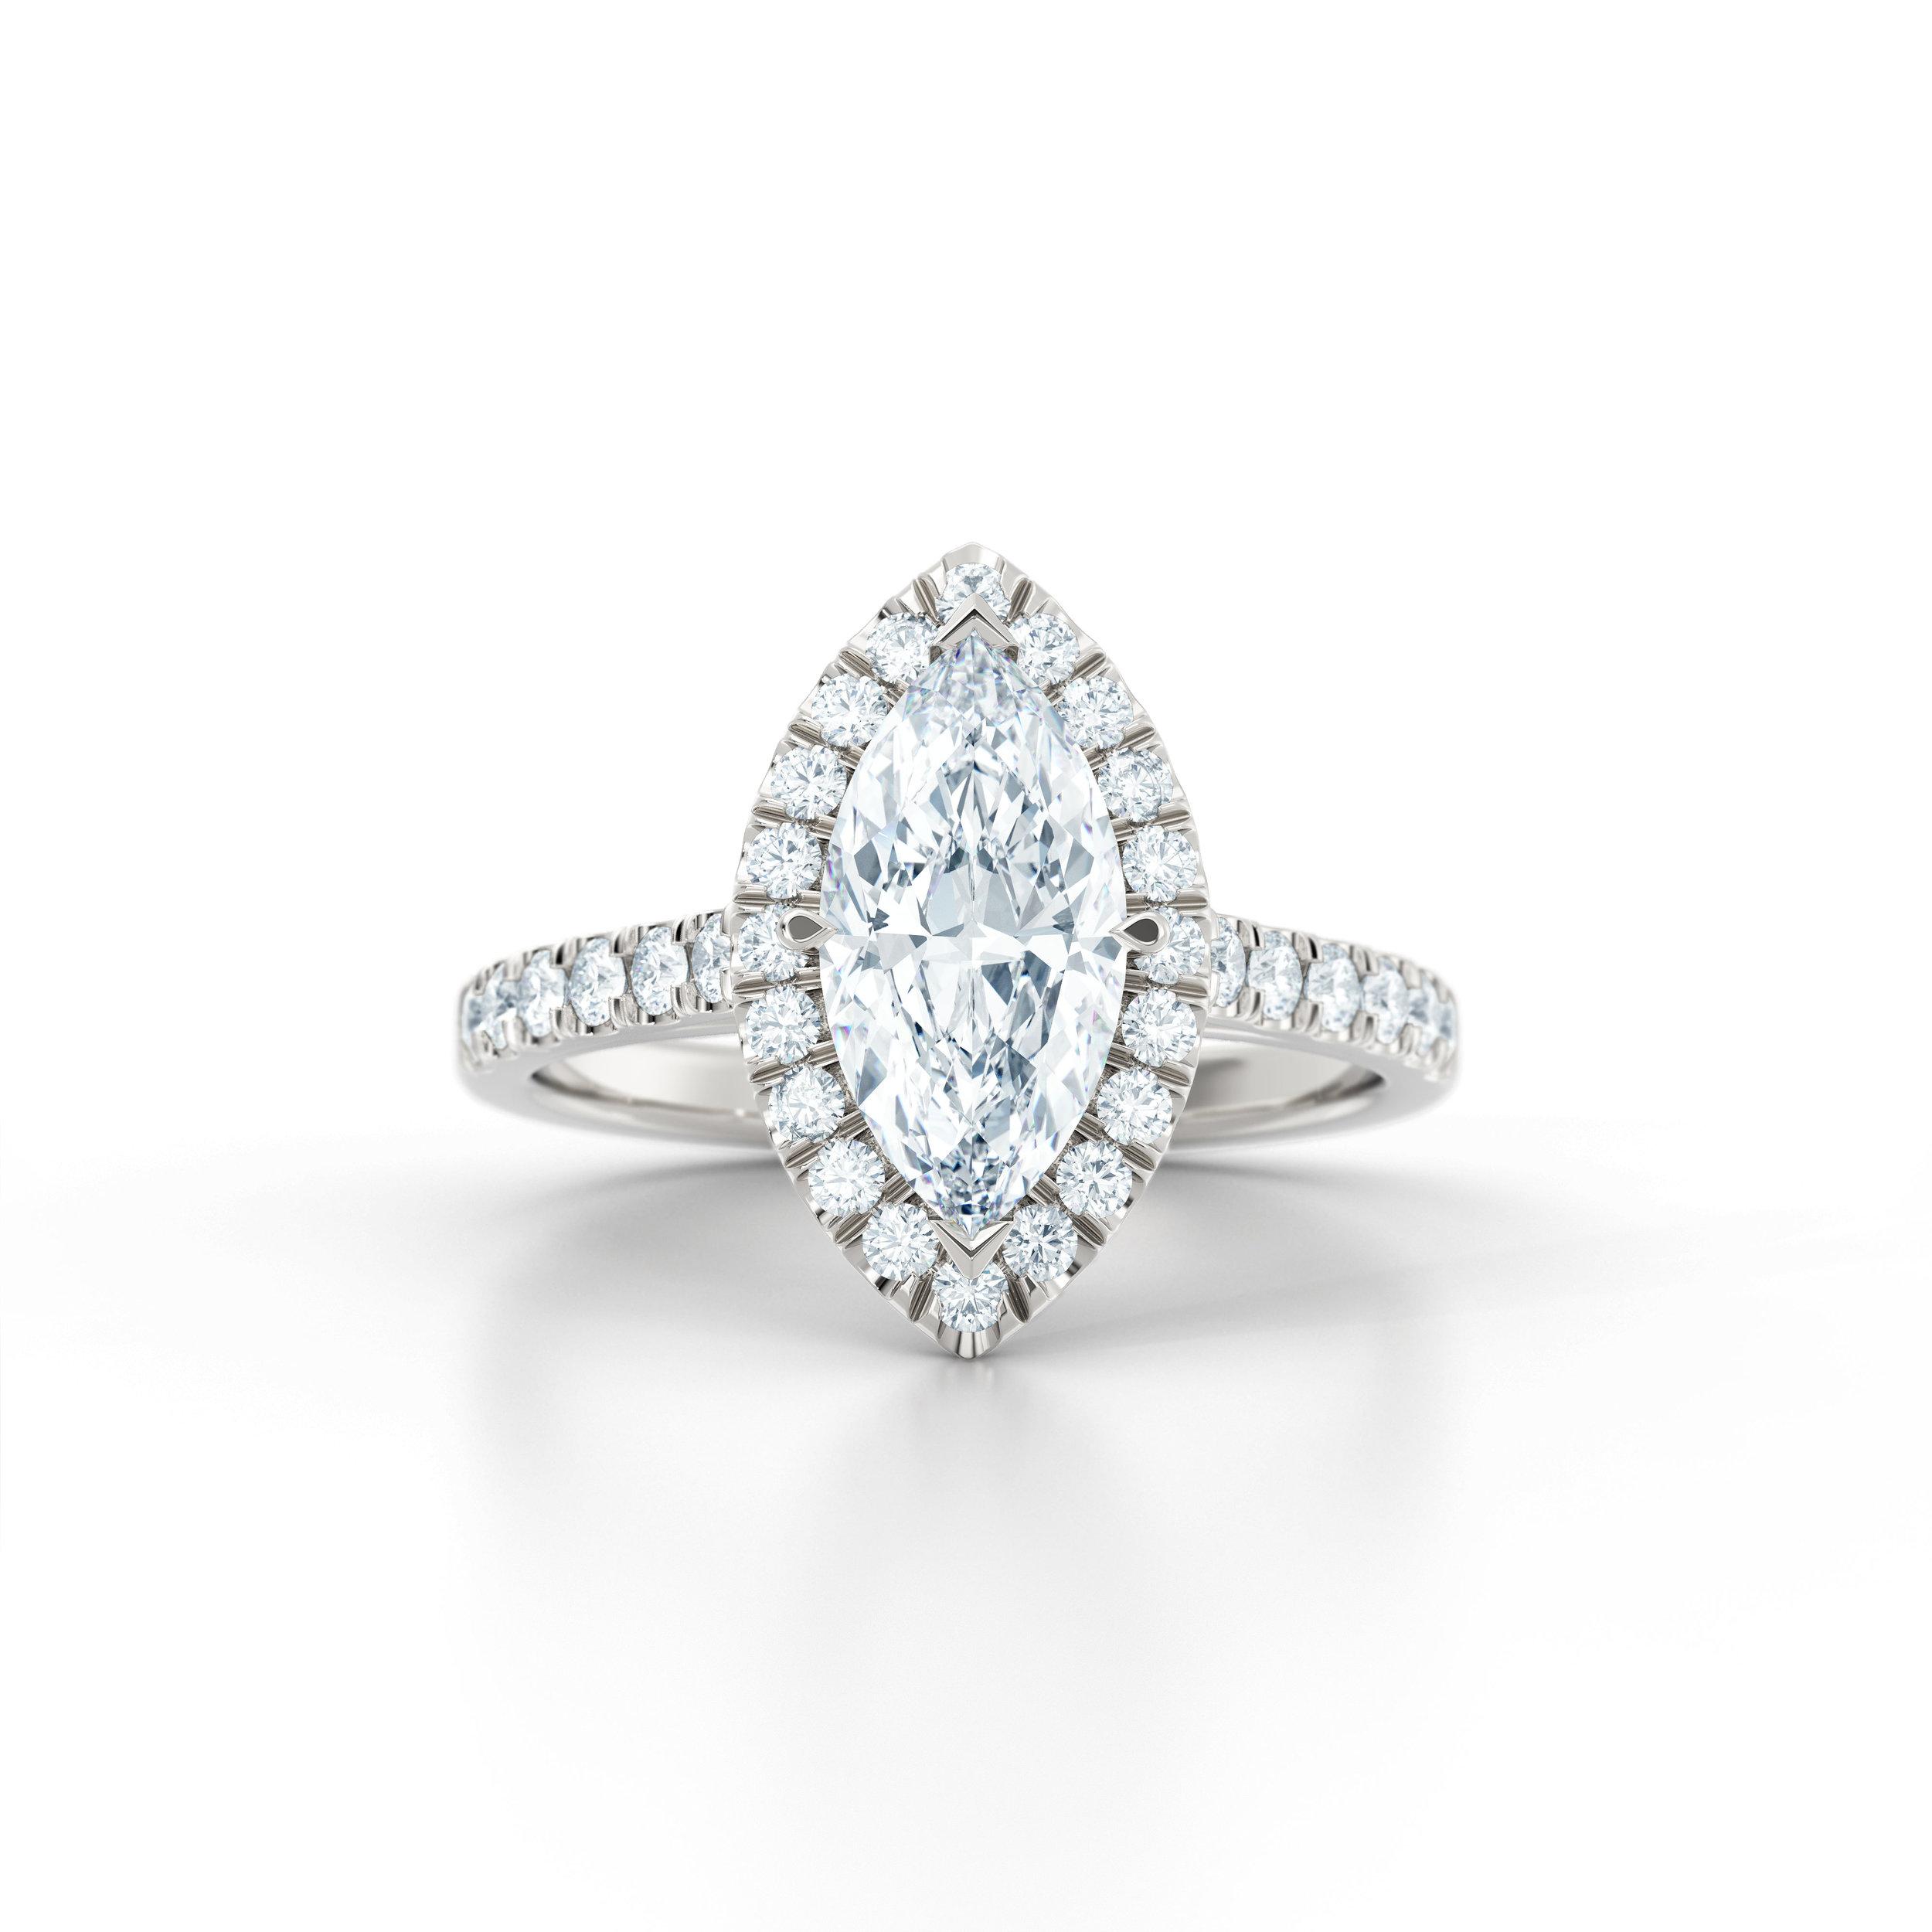 Marquise diamond halo engagement ring